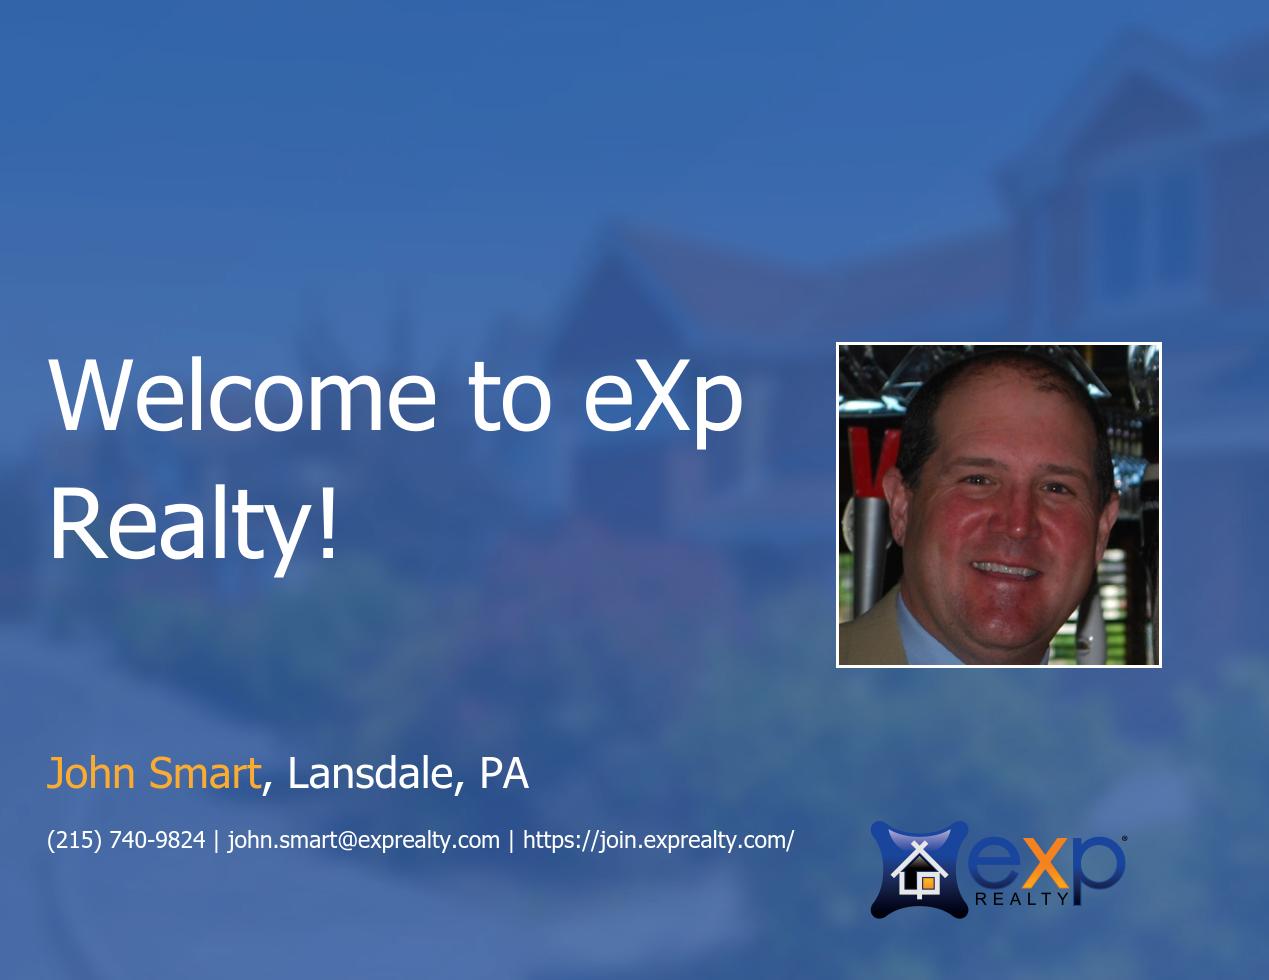 eXp Realty Welcomes John Smart!